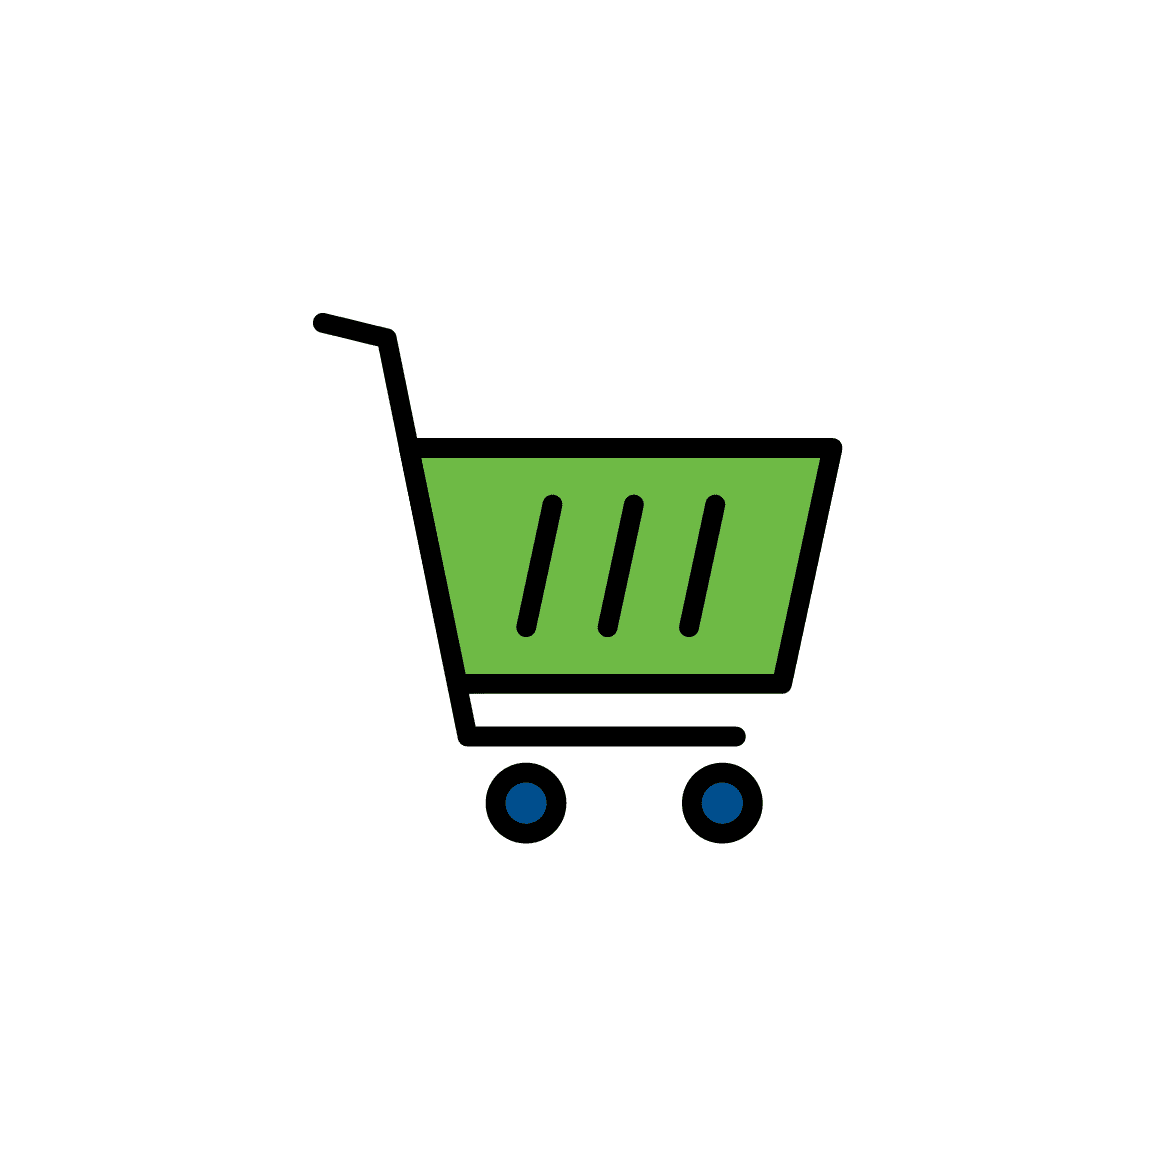 Shops, ecommerce, retail, high street